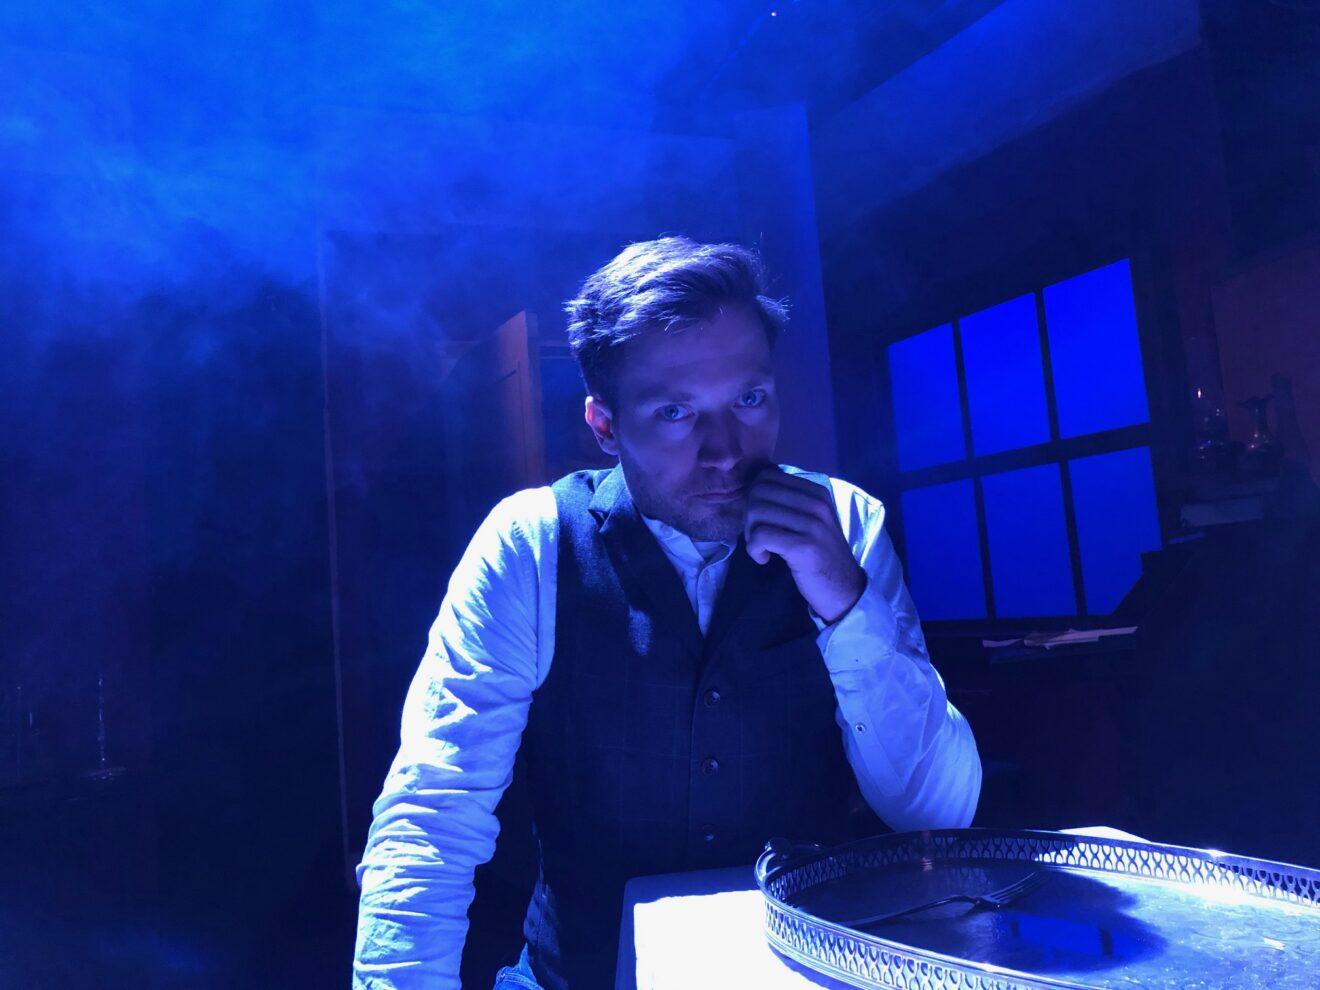 Review: The Strange Case of Dr Jekyll & Mr Hyde, live streamed via Facebook